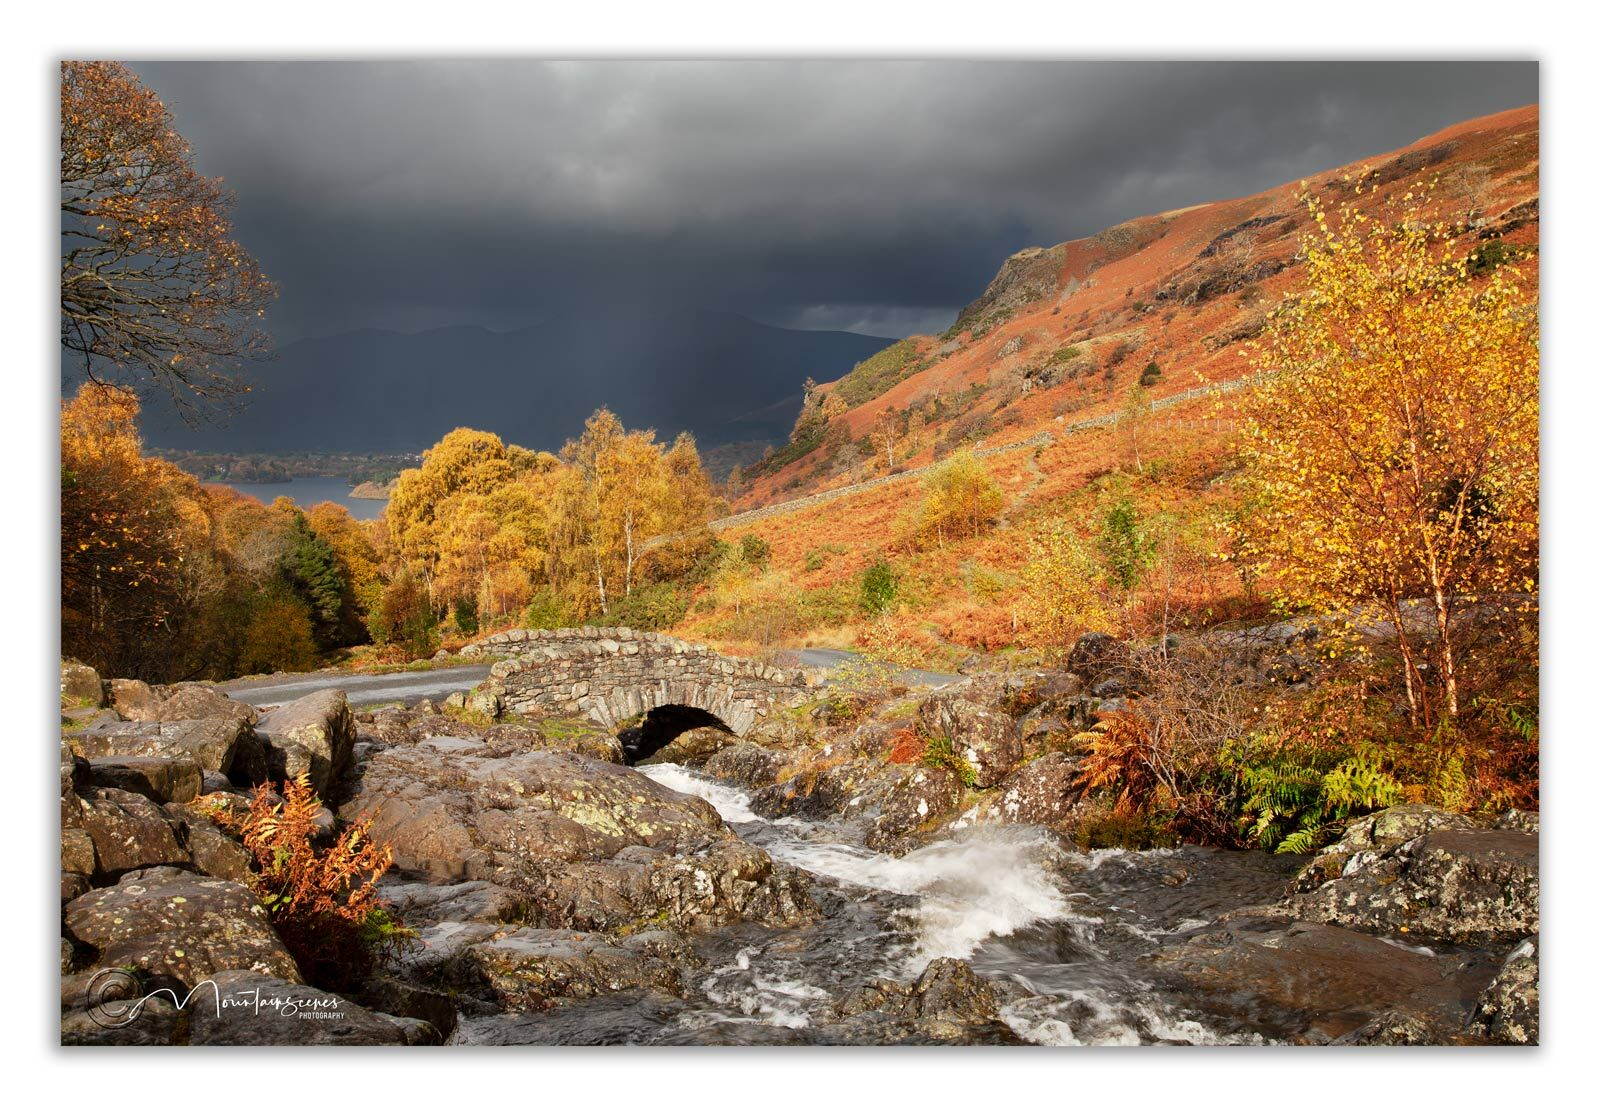 Ashness Bridge in Autumn 2